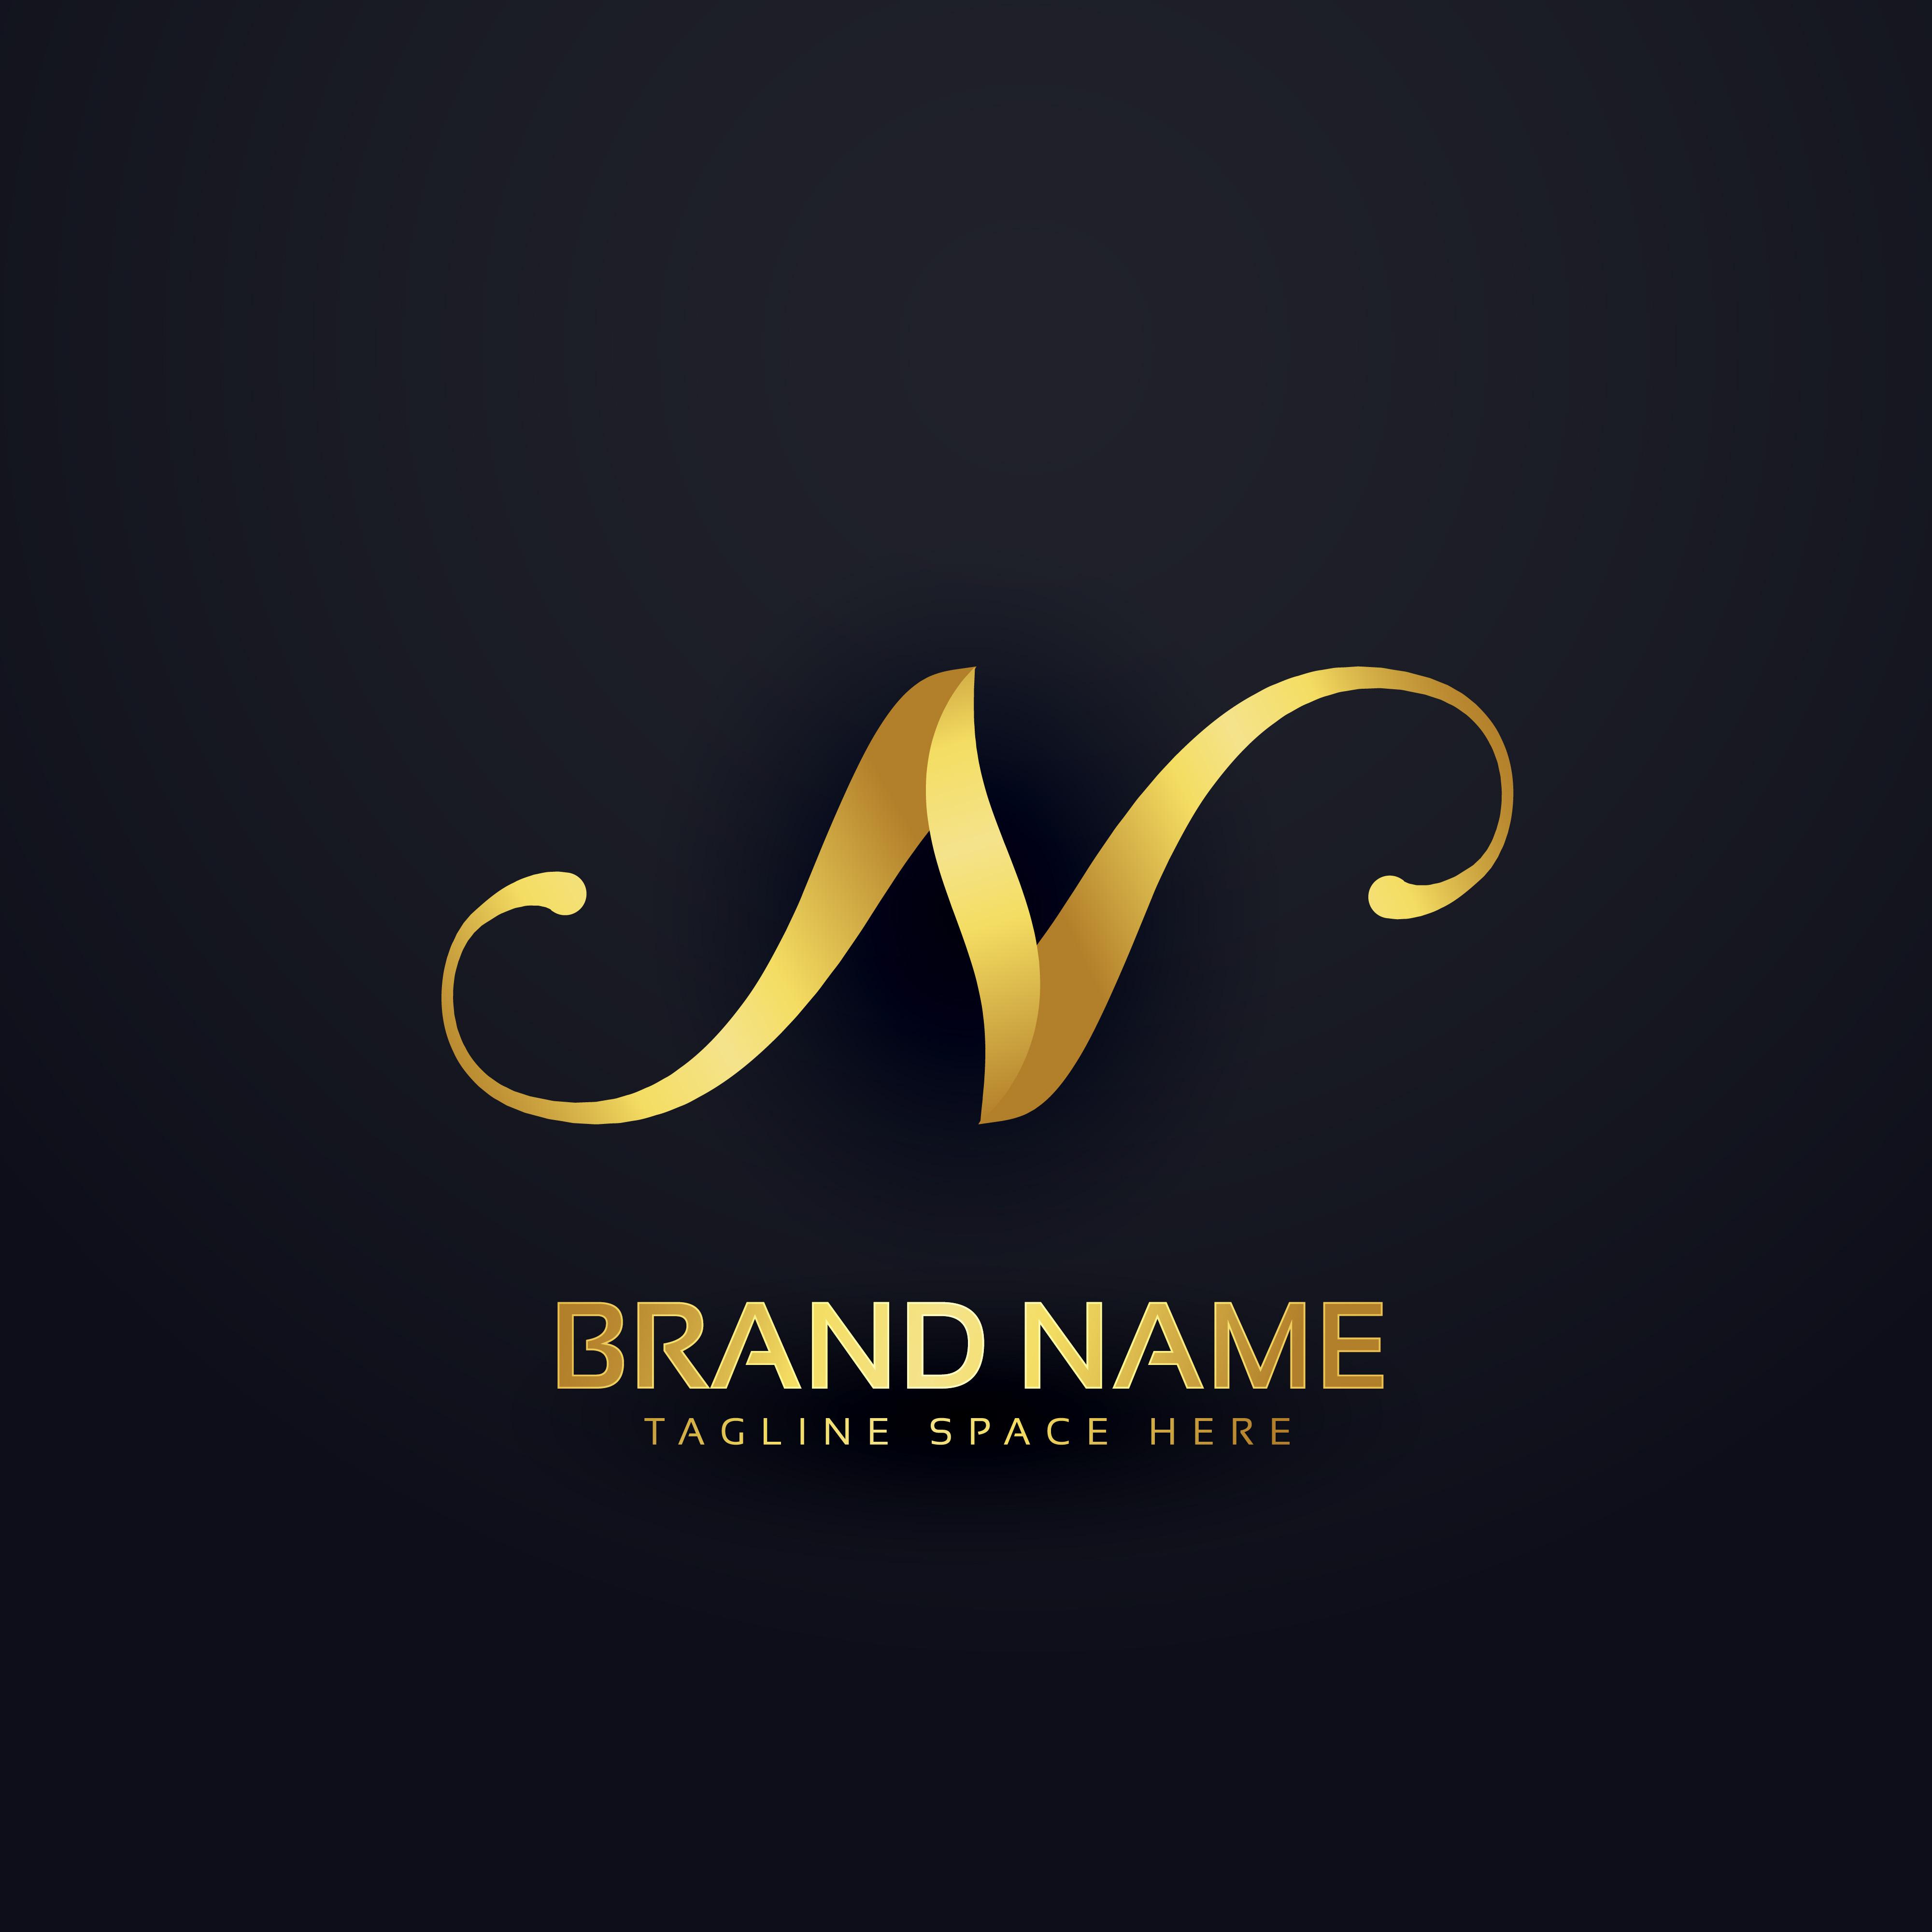 Luxury Brand Name Golden Floral Logo Concept Design: Premium Letter N Logo Design Template With Swirl Effect